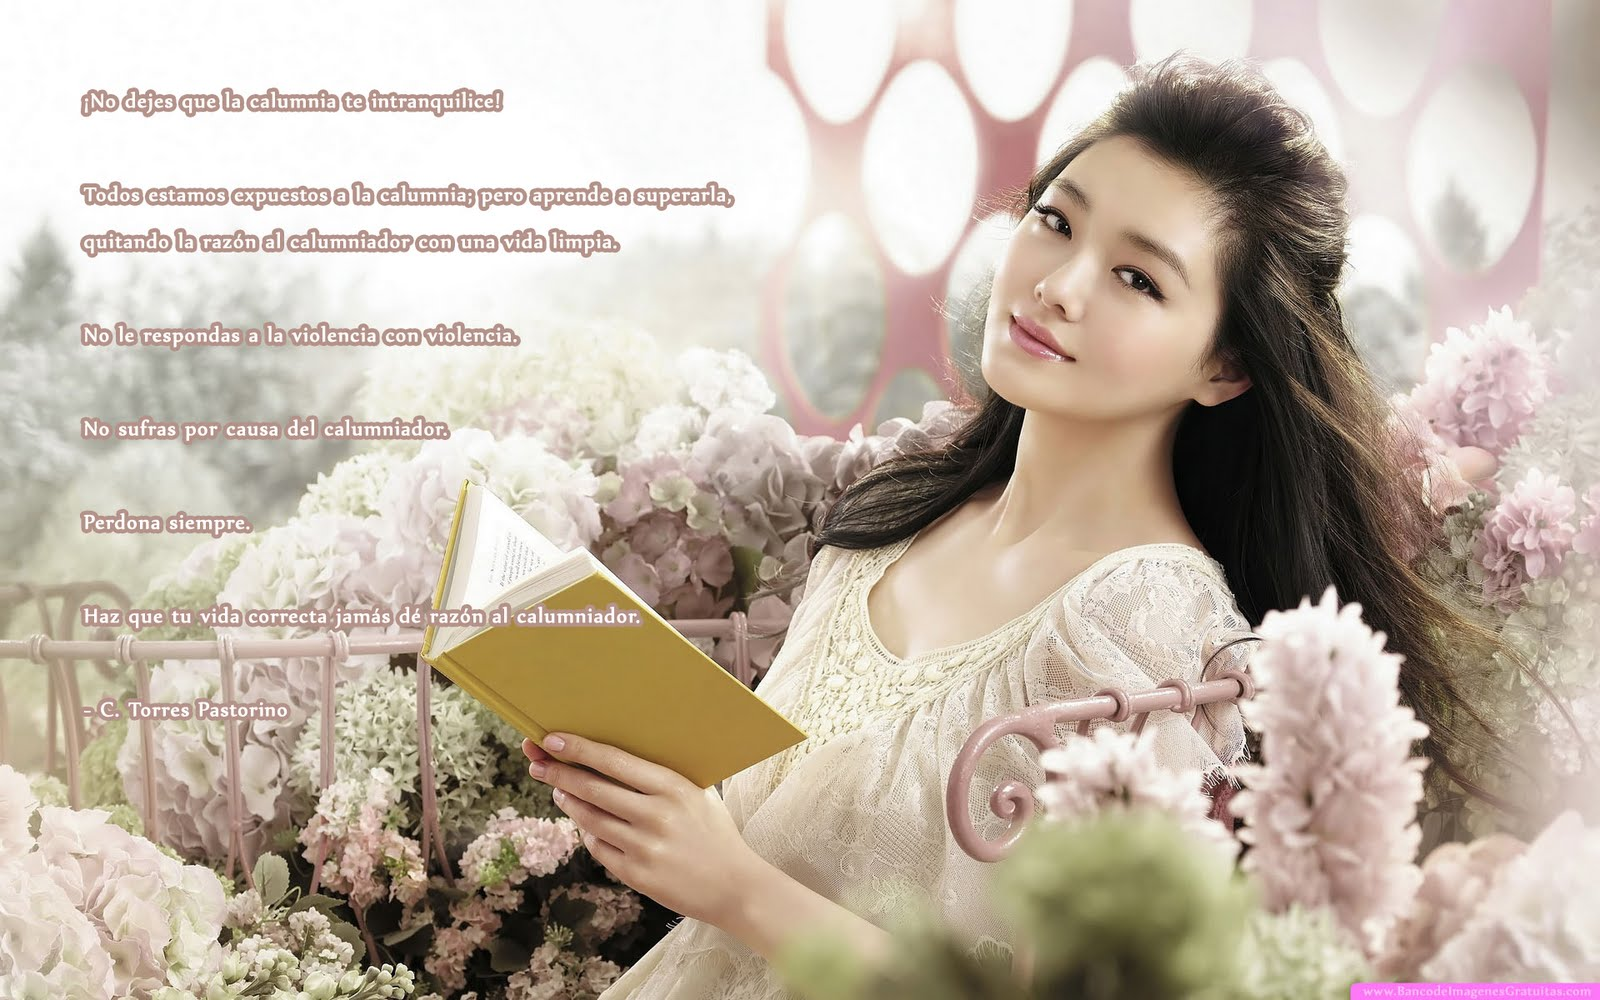 http://2.bp.blogspot.com/-cMIy4EW4tZU/Tq7xjJhp0nI/AAAAAAAAovg/ncjxDY920dA/s1600/www.BancodeImagenesGratuitas.com-hermosa-mujer-asiatica-leyendo-con-reflexion.jpg